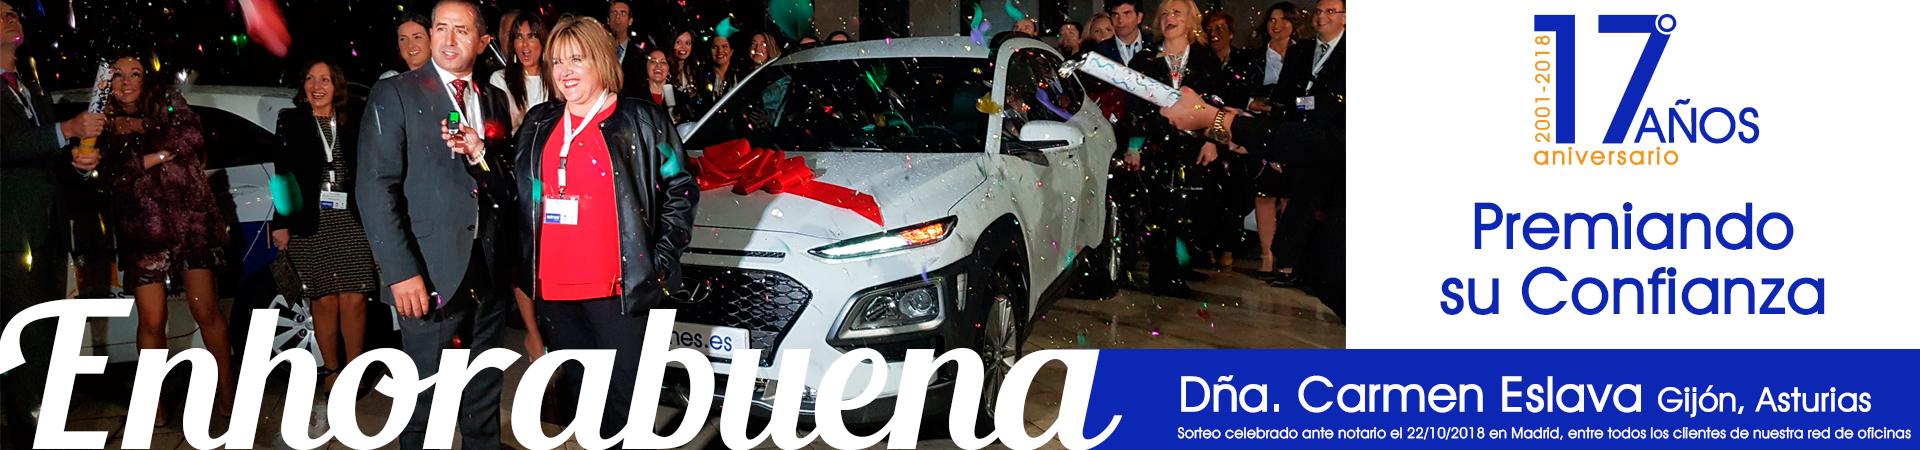 Banner entrega premio coche Hyundai Reines Grupo Inmobiliario